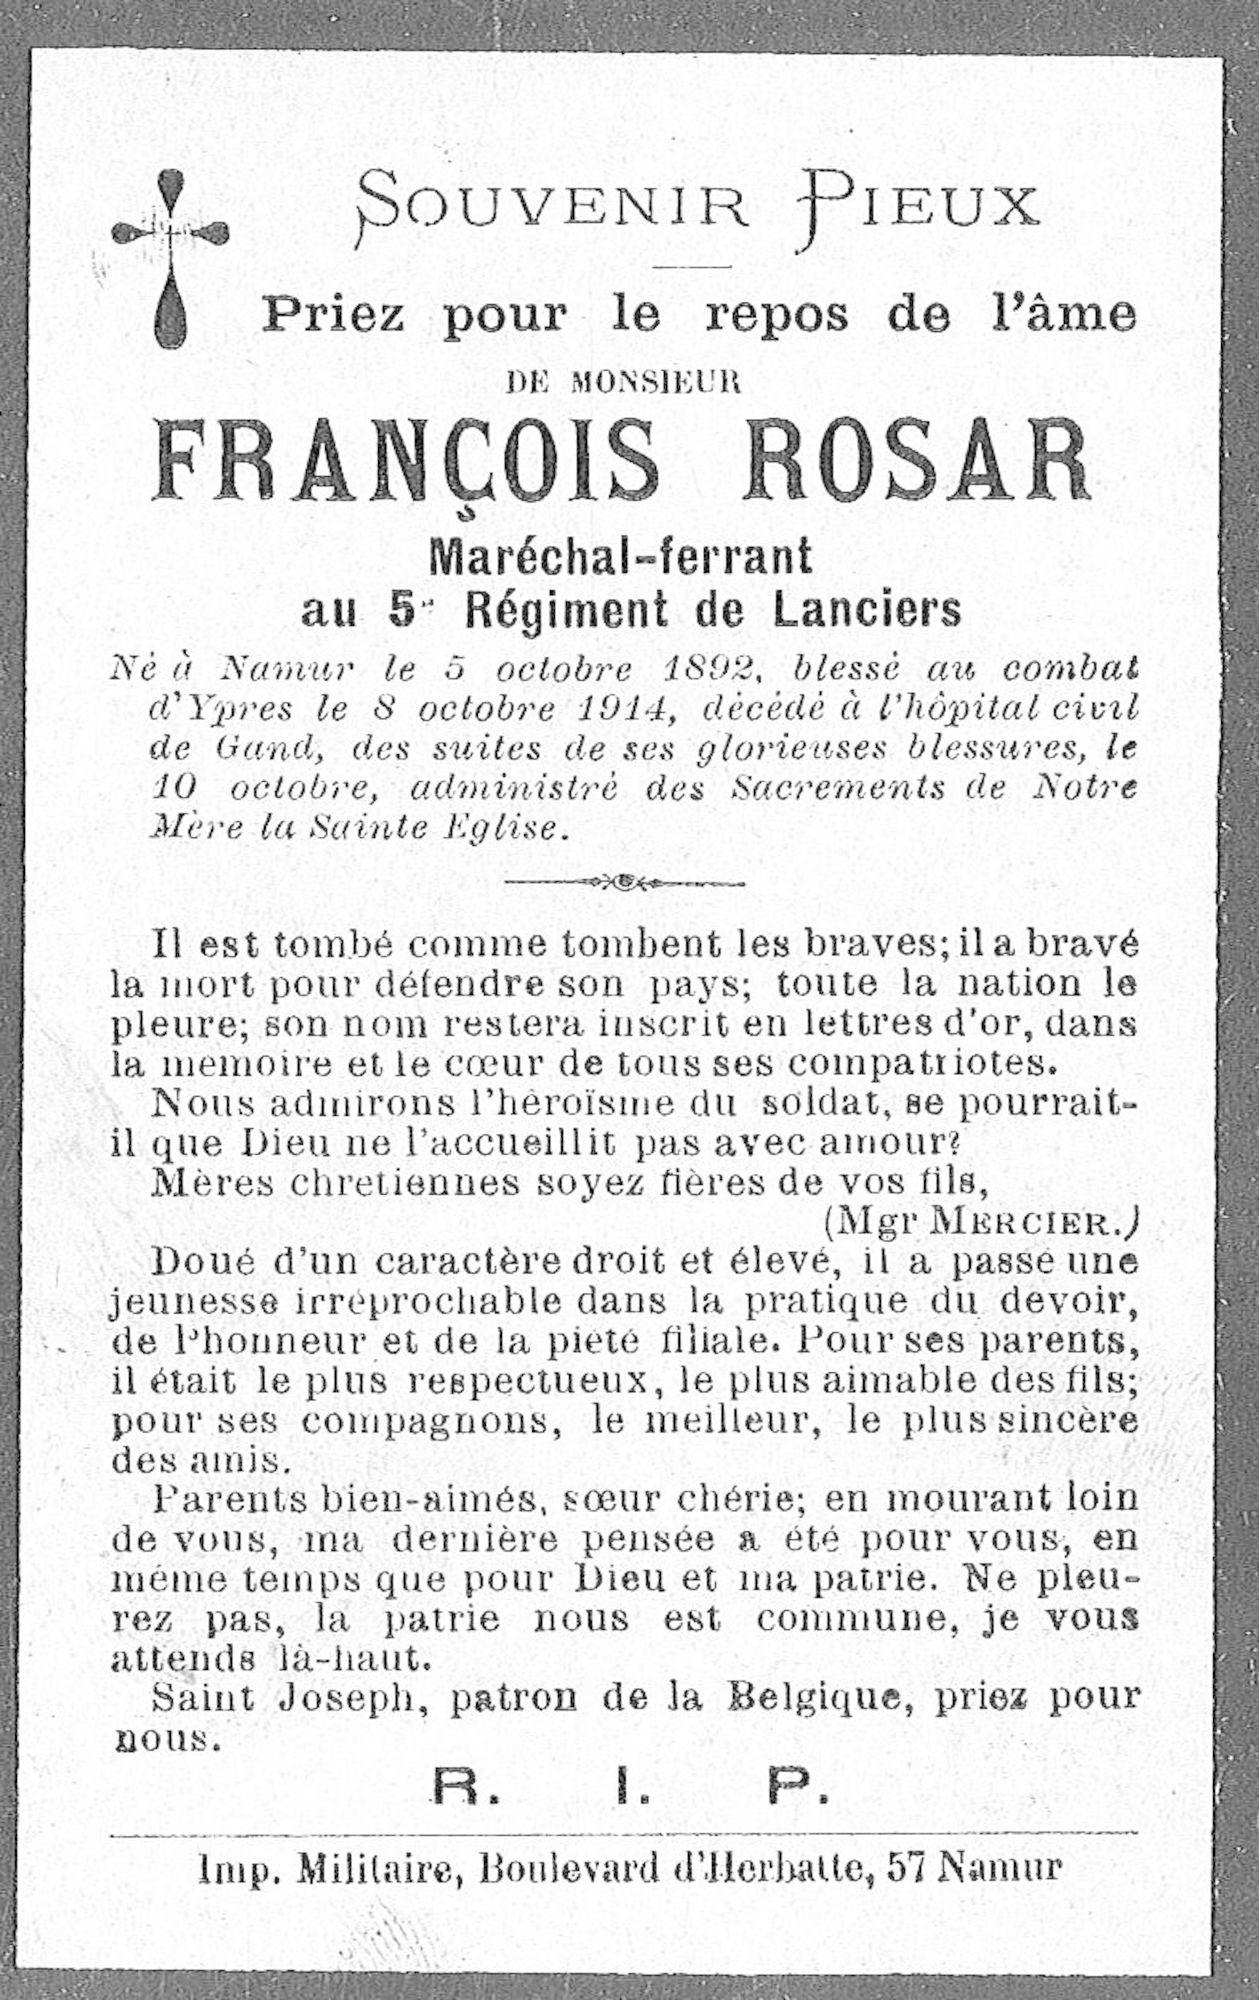 Rosar François